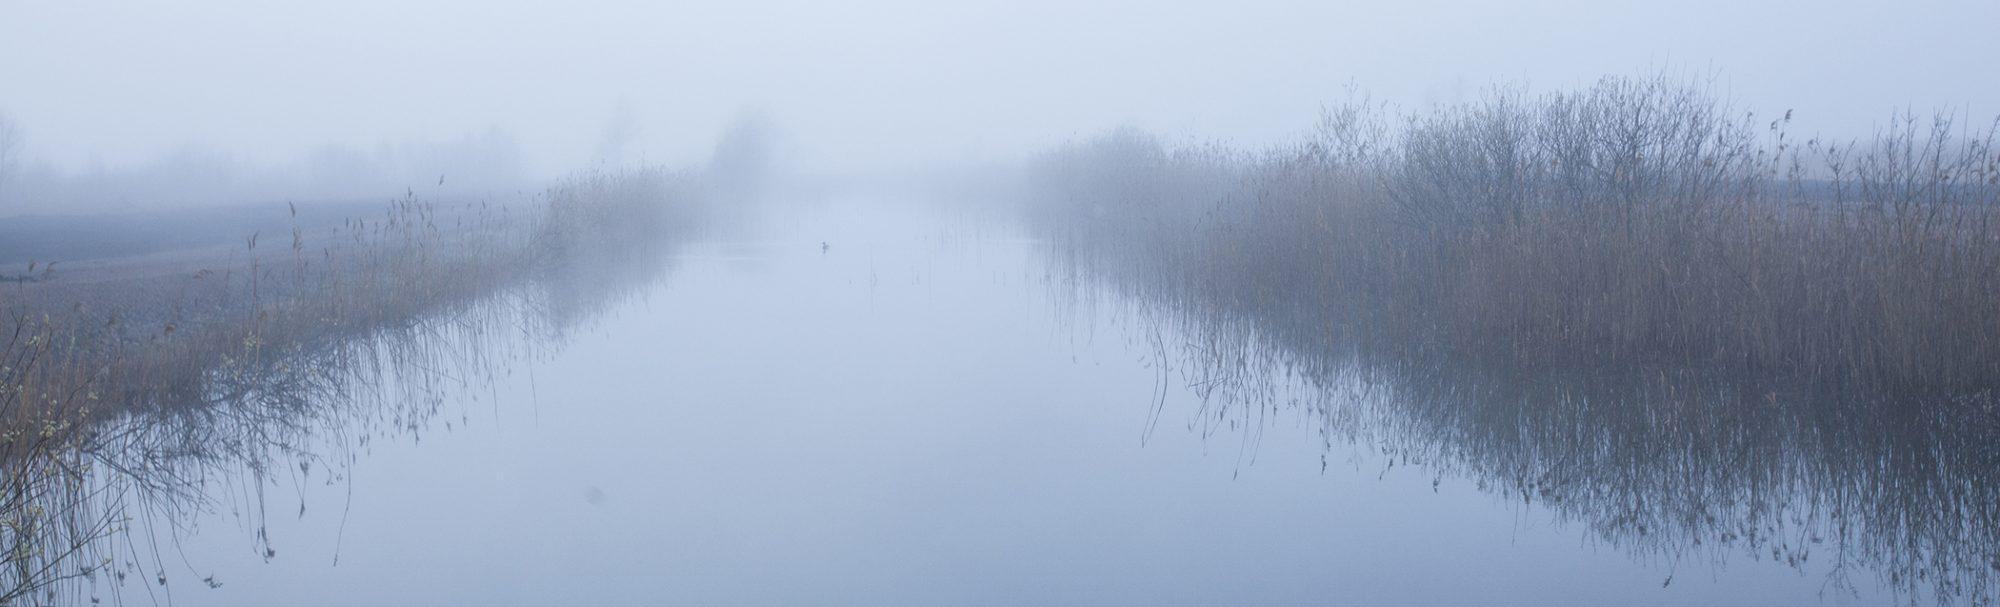 Mossen i dimma